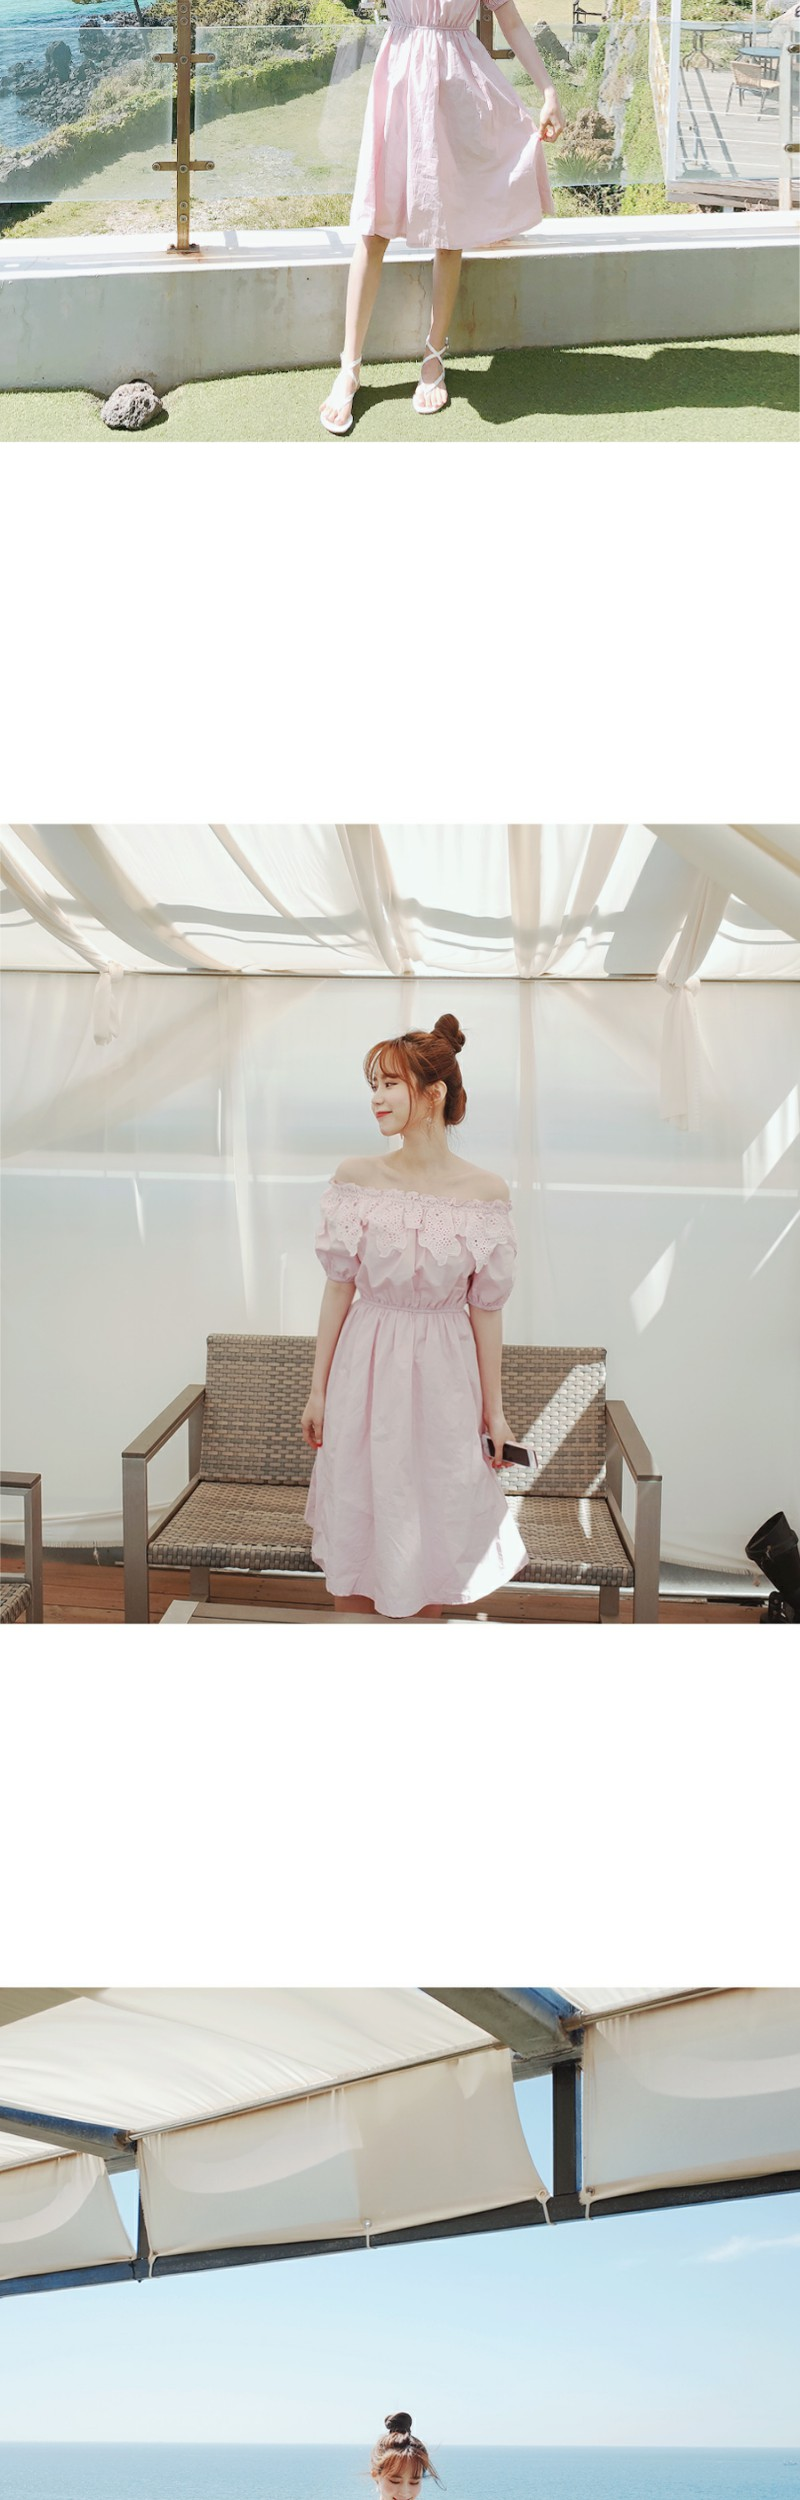 Lace-off dress